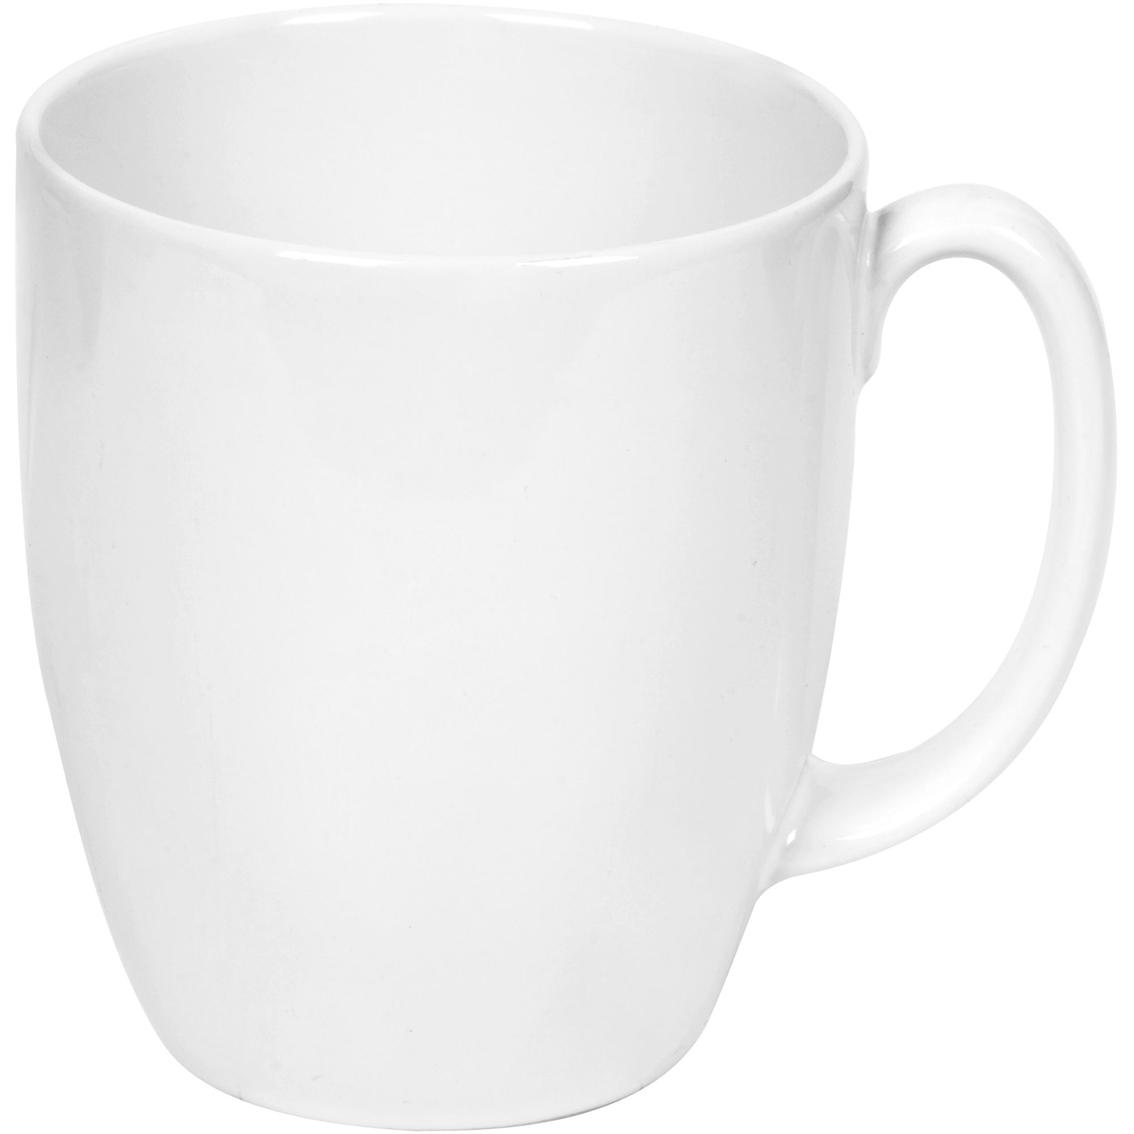 3550  sc 1 st  ShopMyExchange.com & Corelle Livingware Winter Frost White Mug | Coffee u0026 Tea Mugs | Home ...